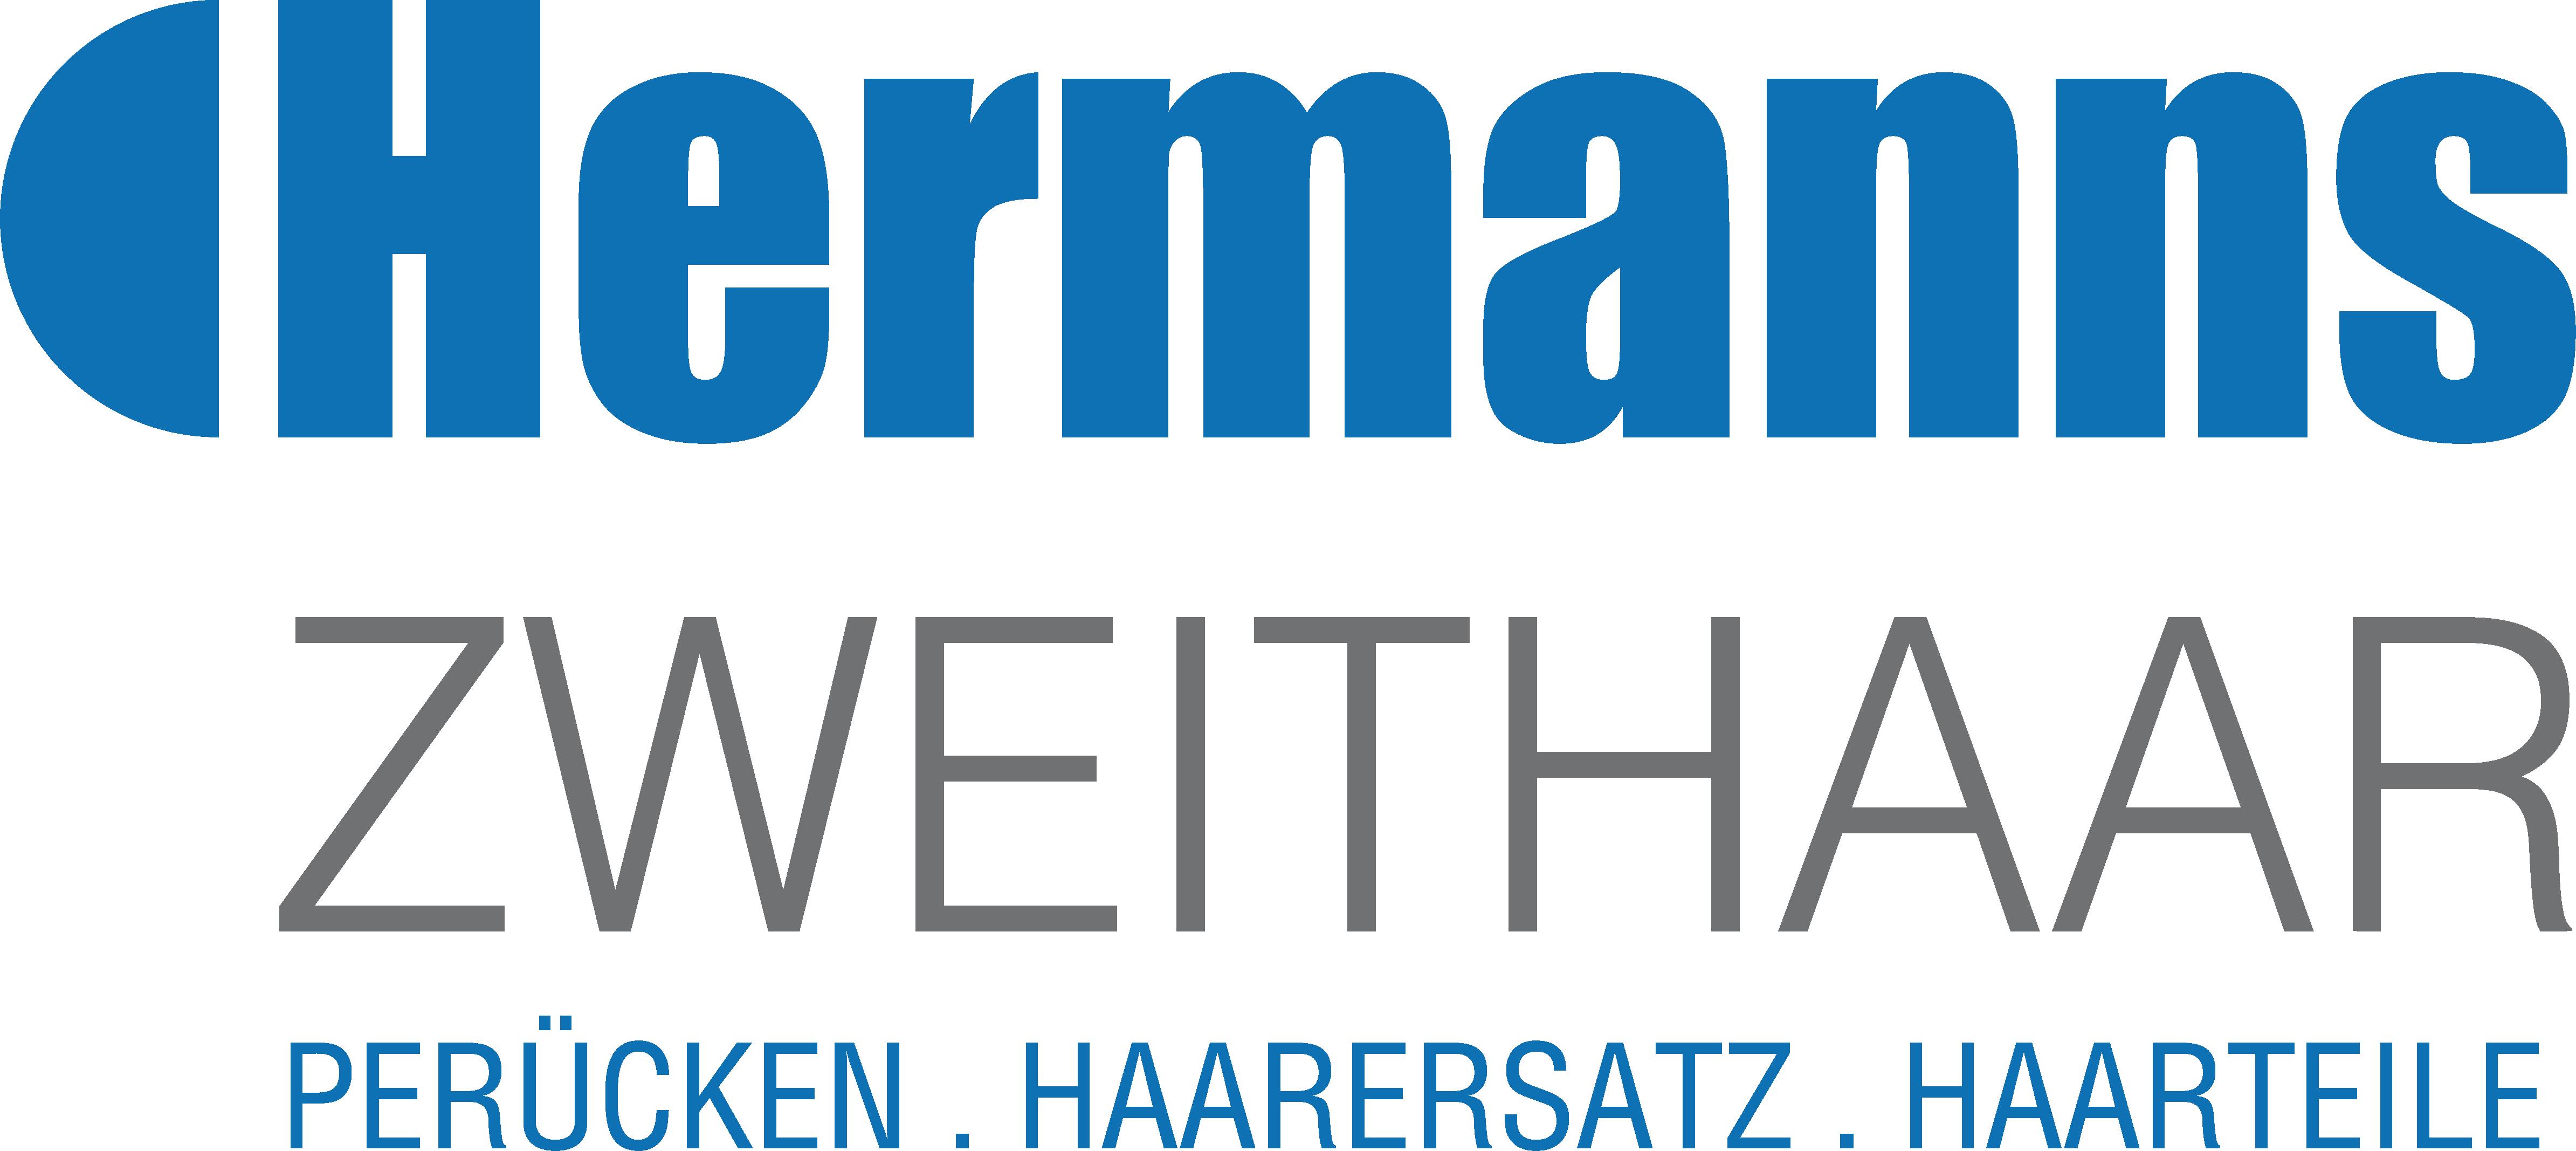 Hermanns Zweithaar